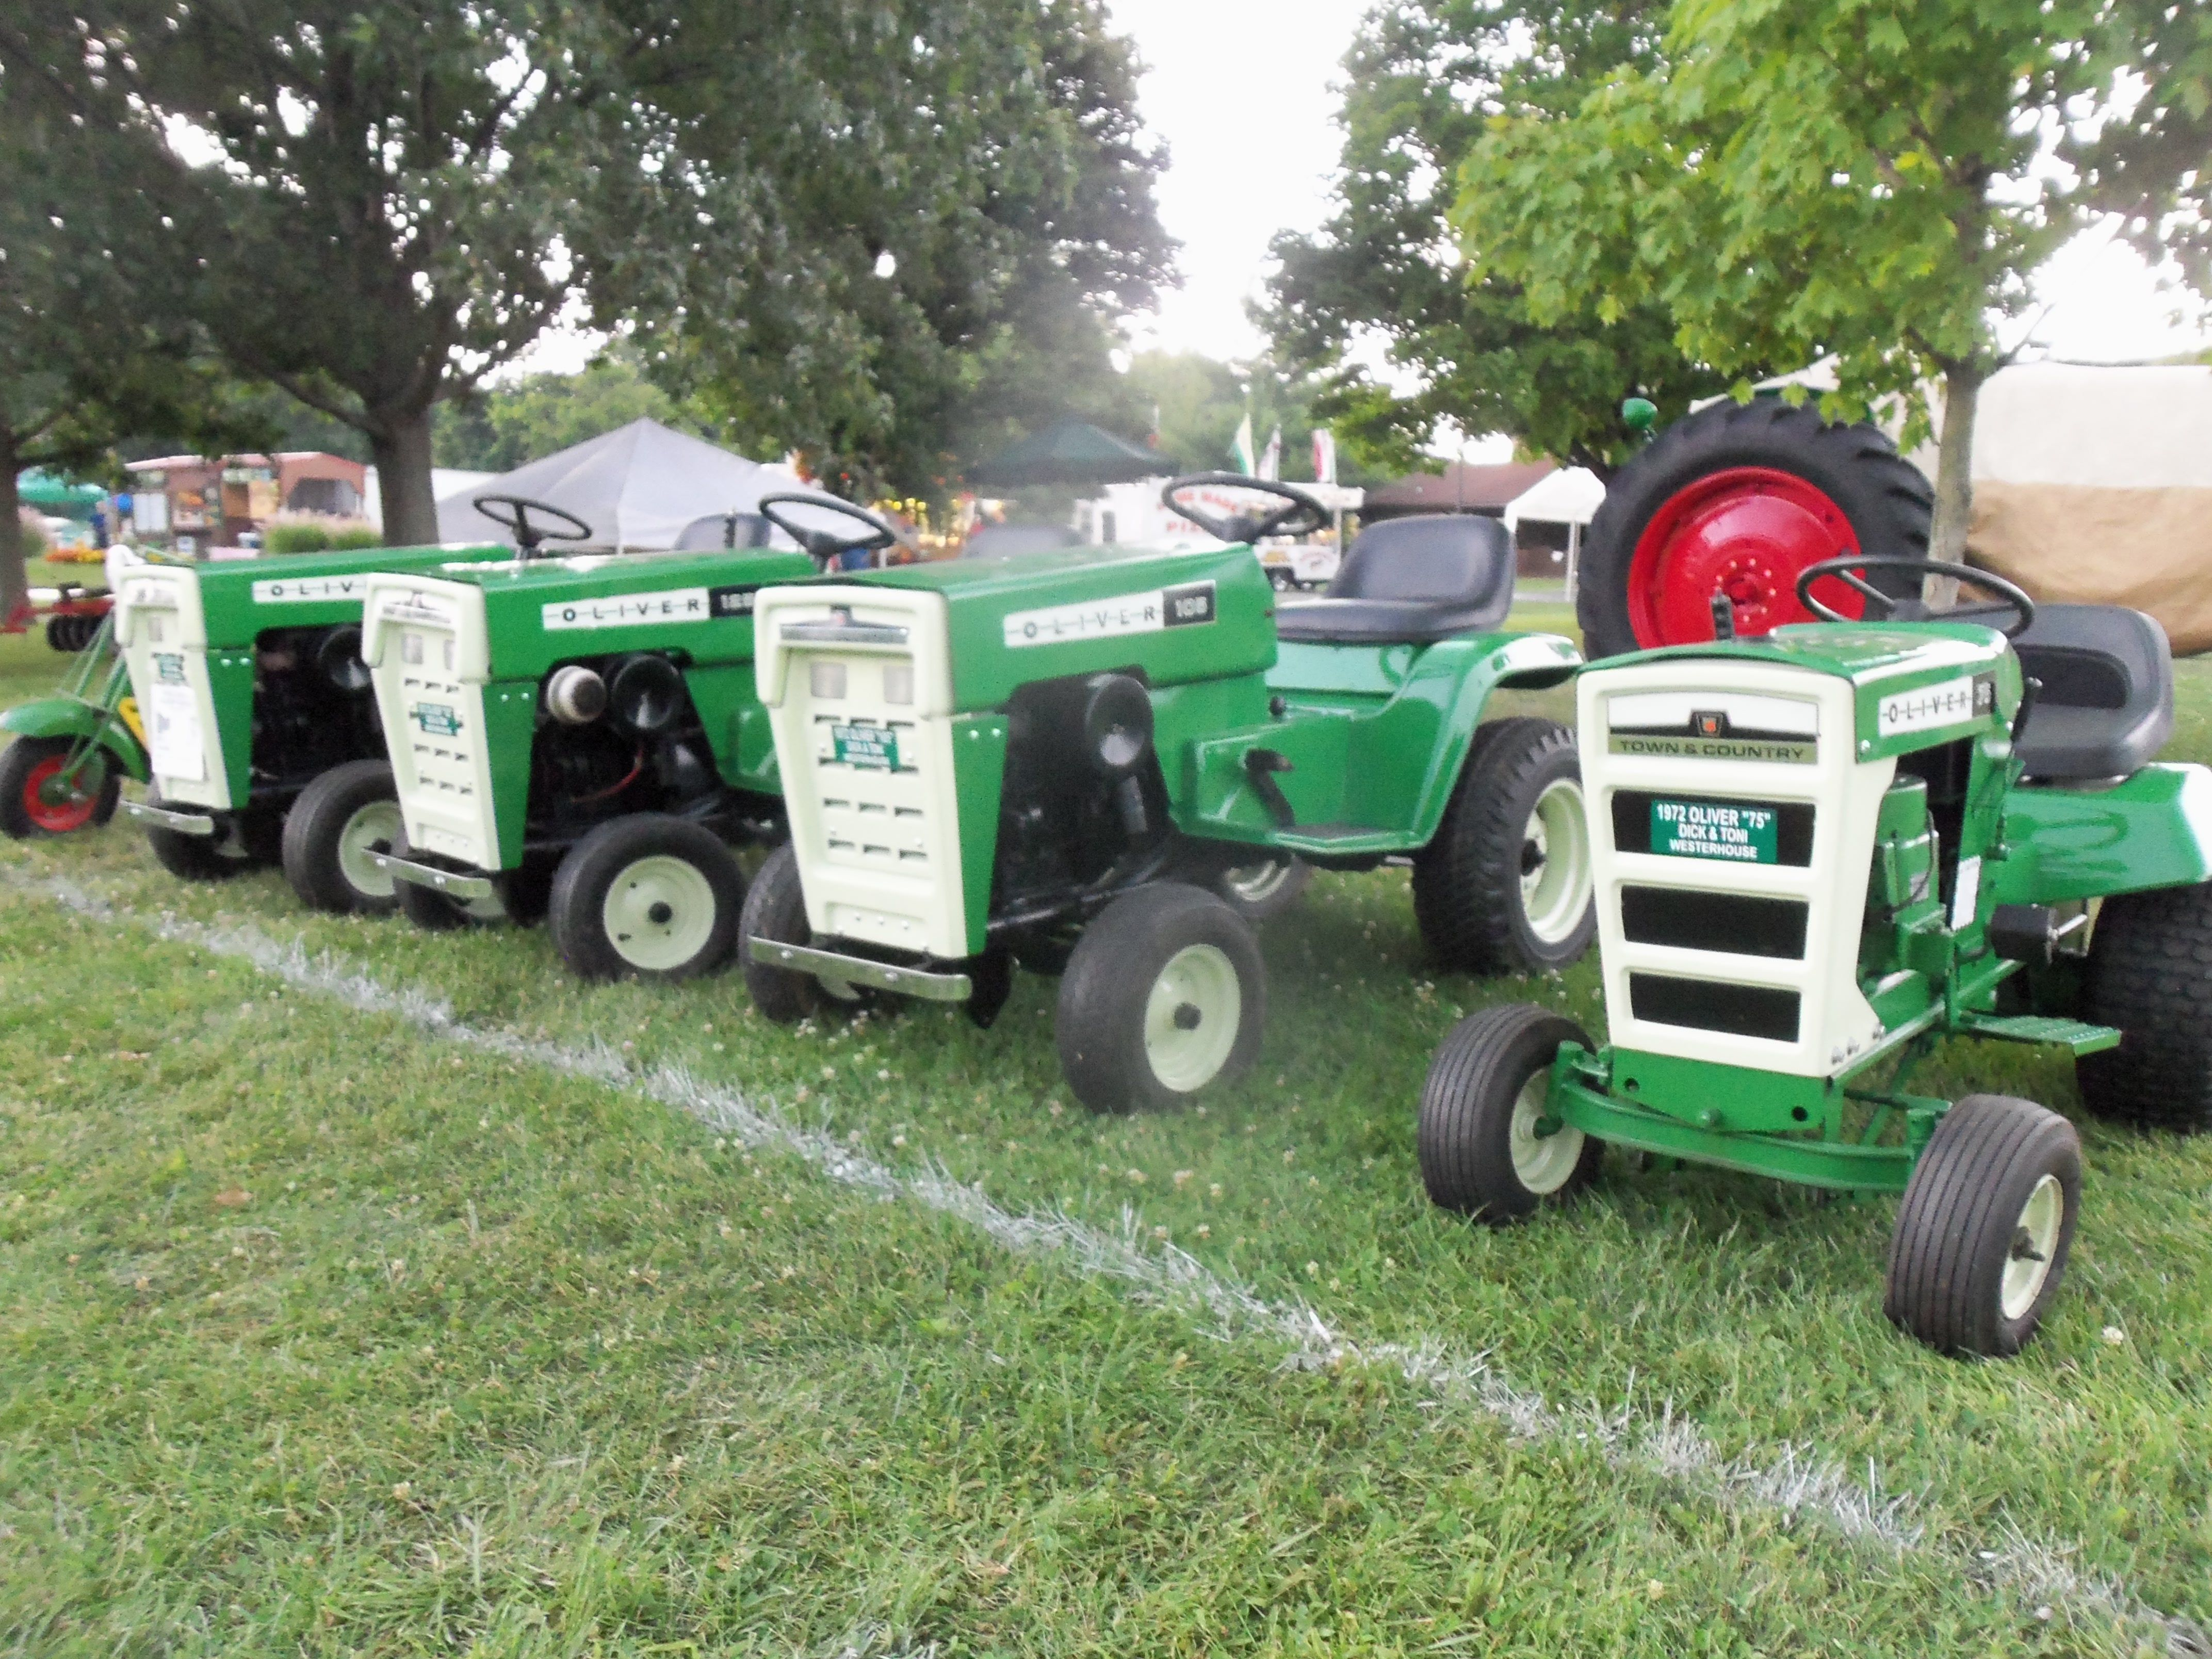 Show home build gas powered mini tractors - Oliver 75 105 125 145 Lawn Garden Tractors